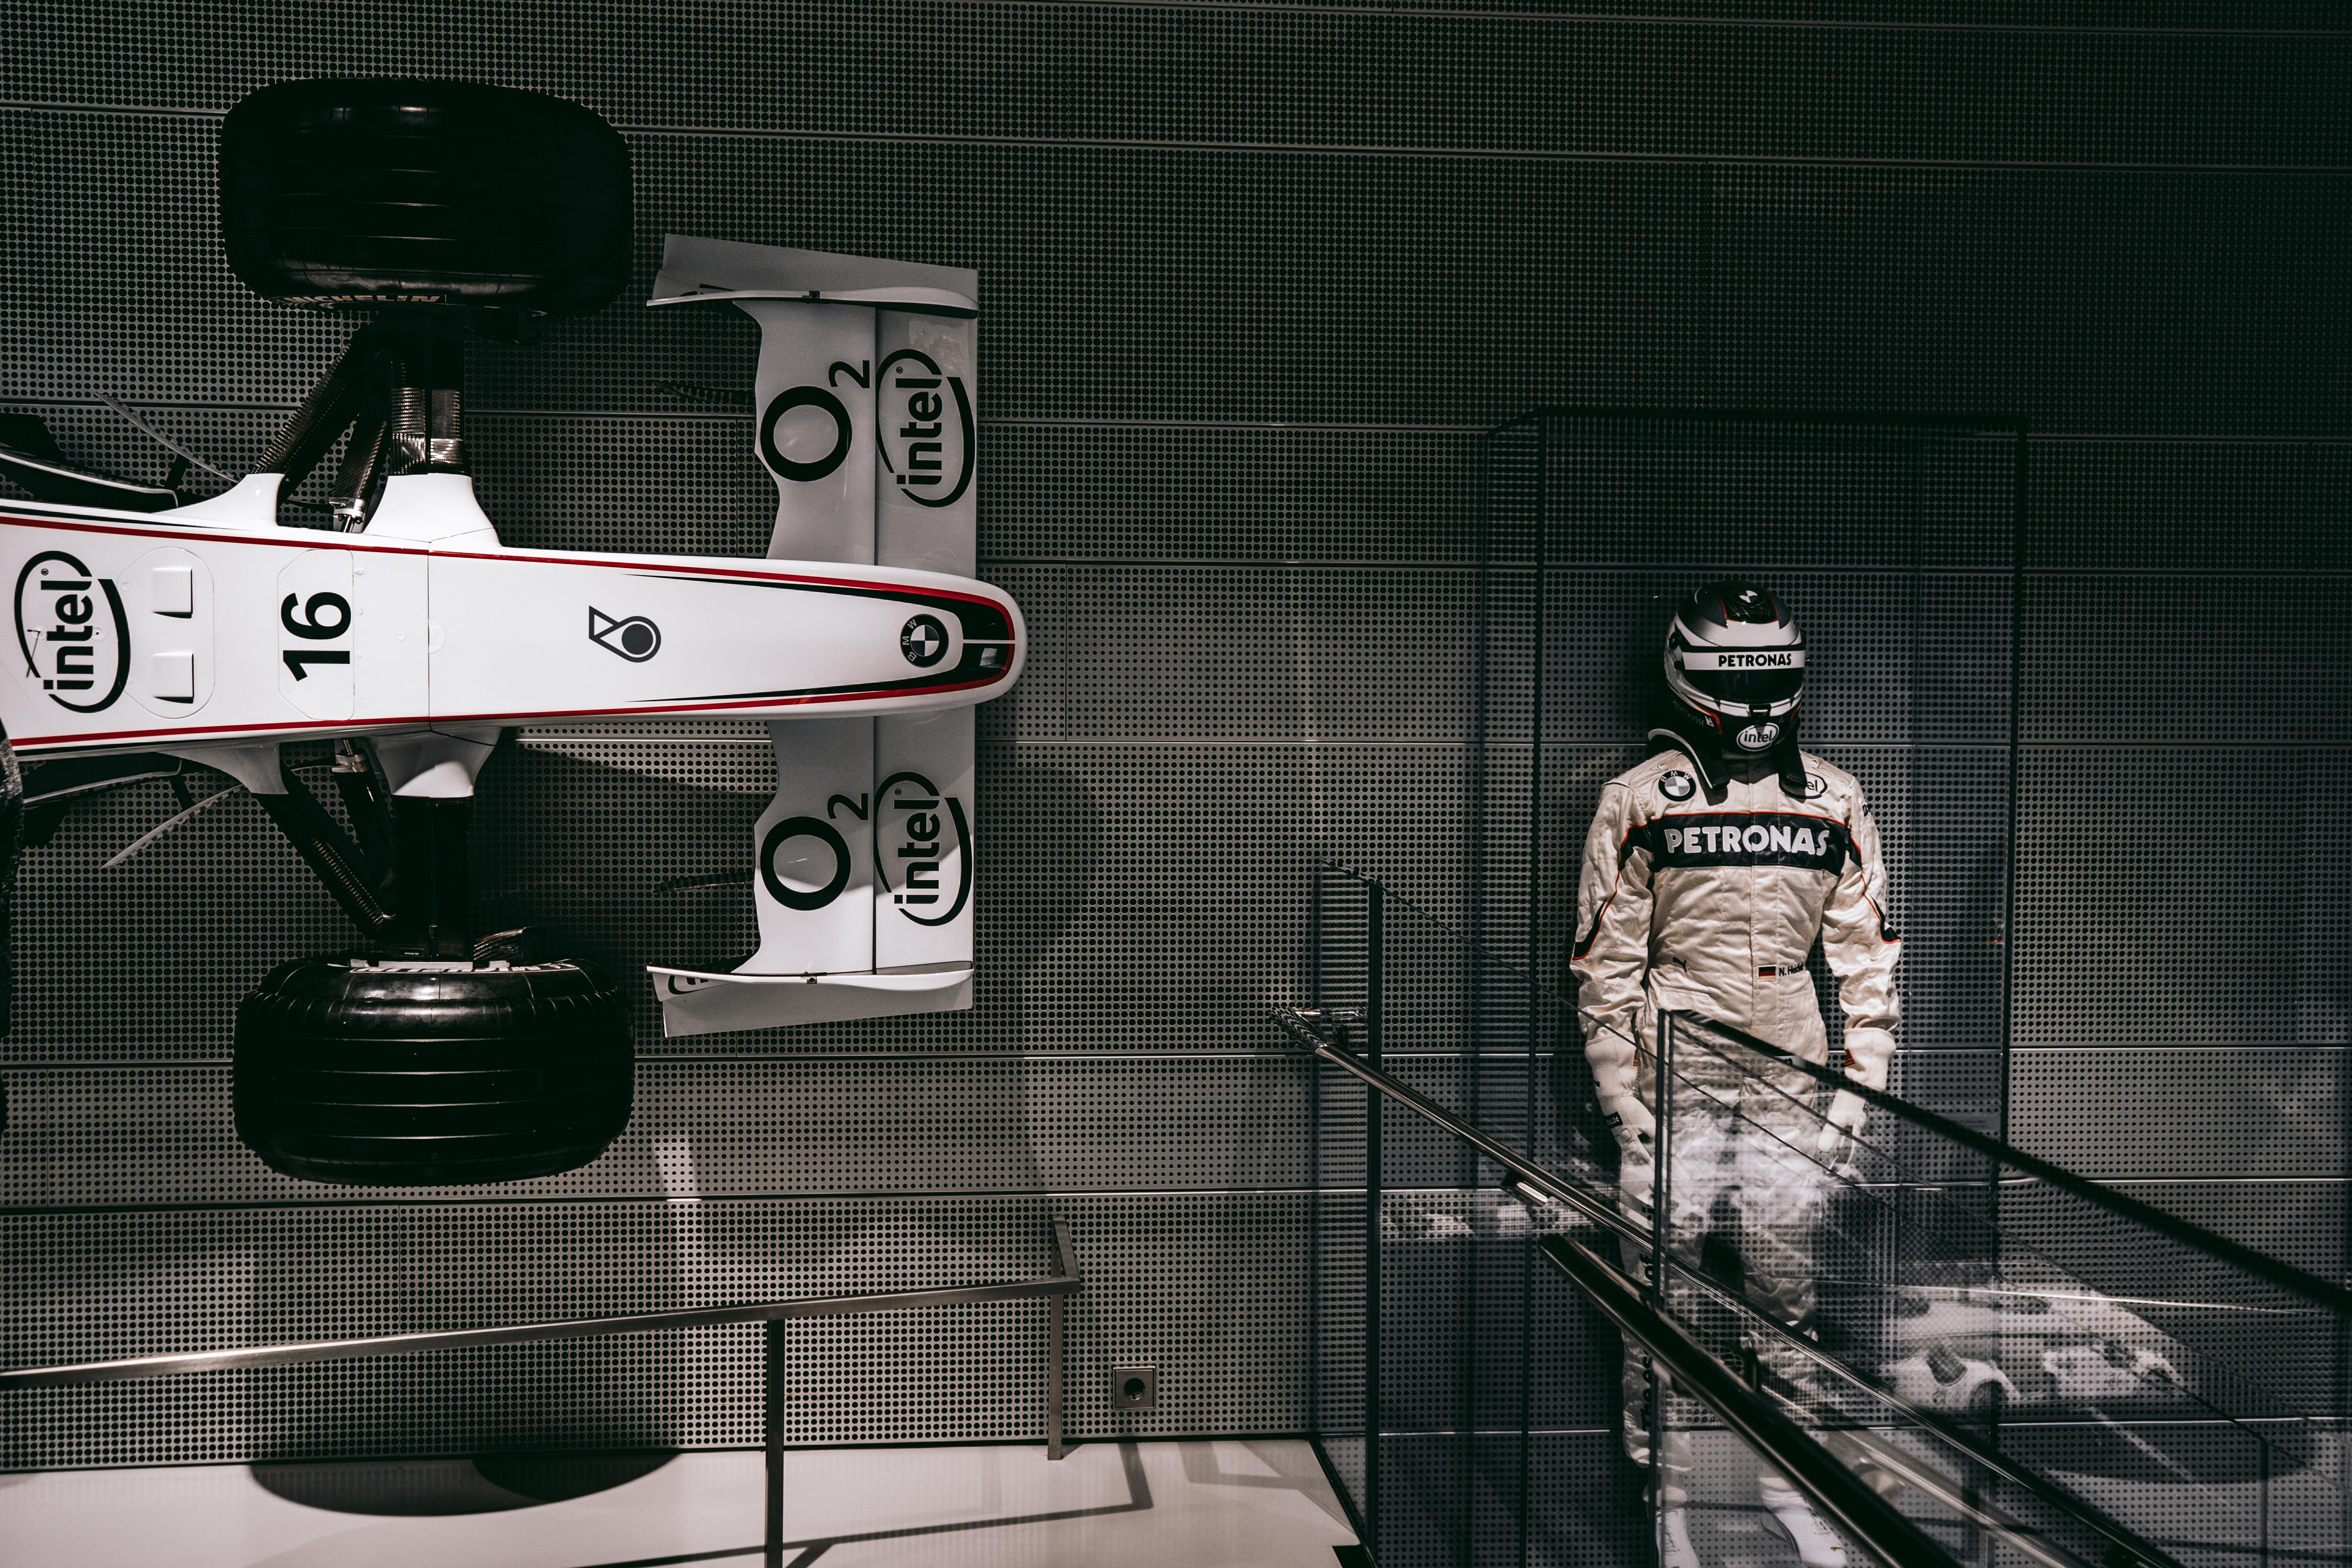 F1 Driver Statue Beside F1 Car